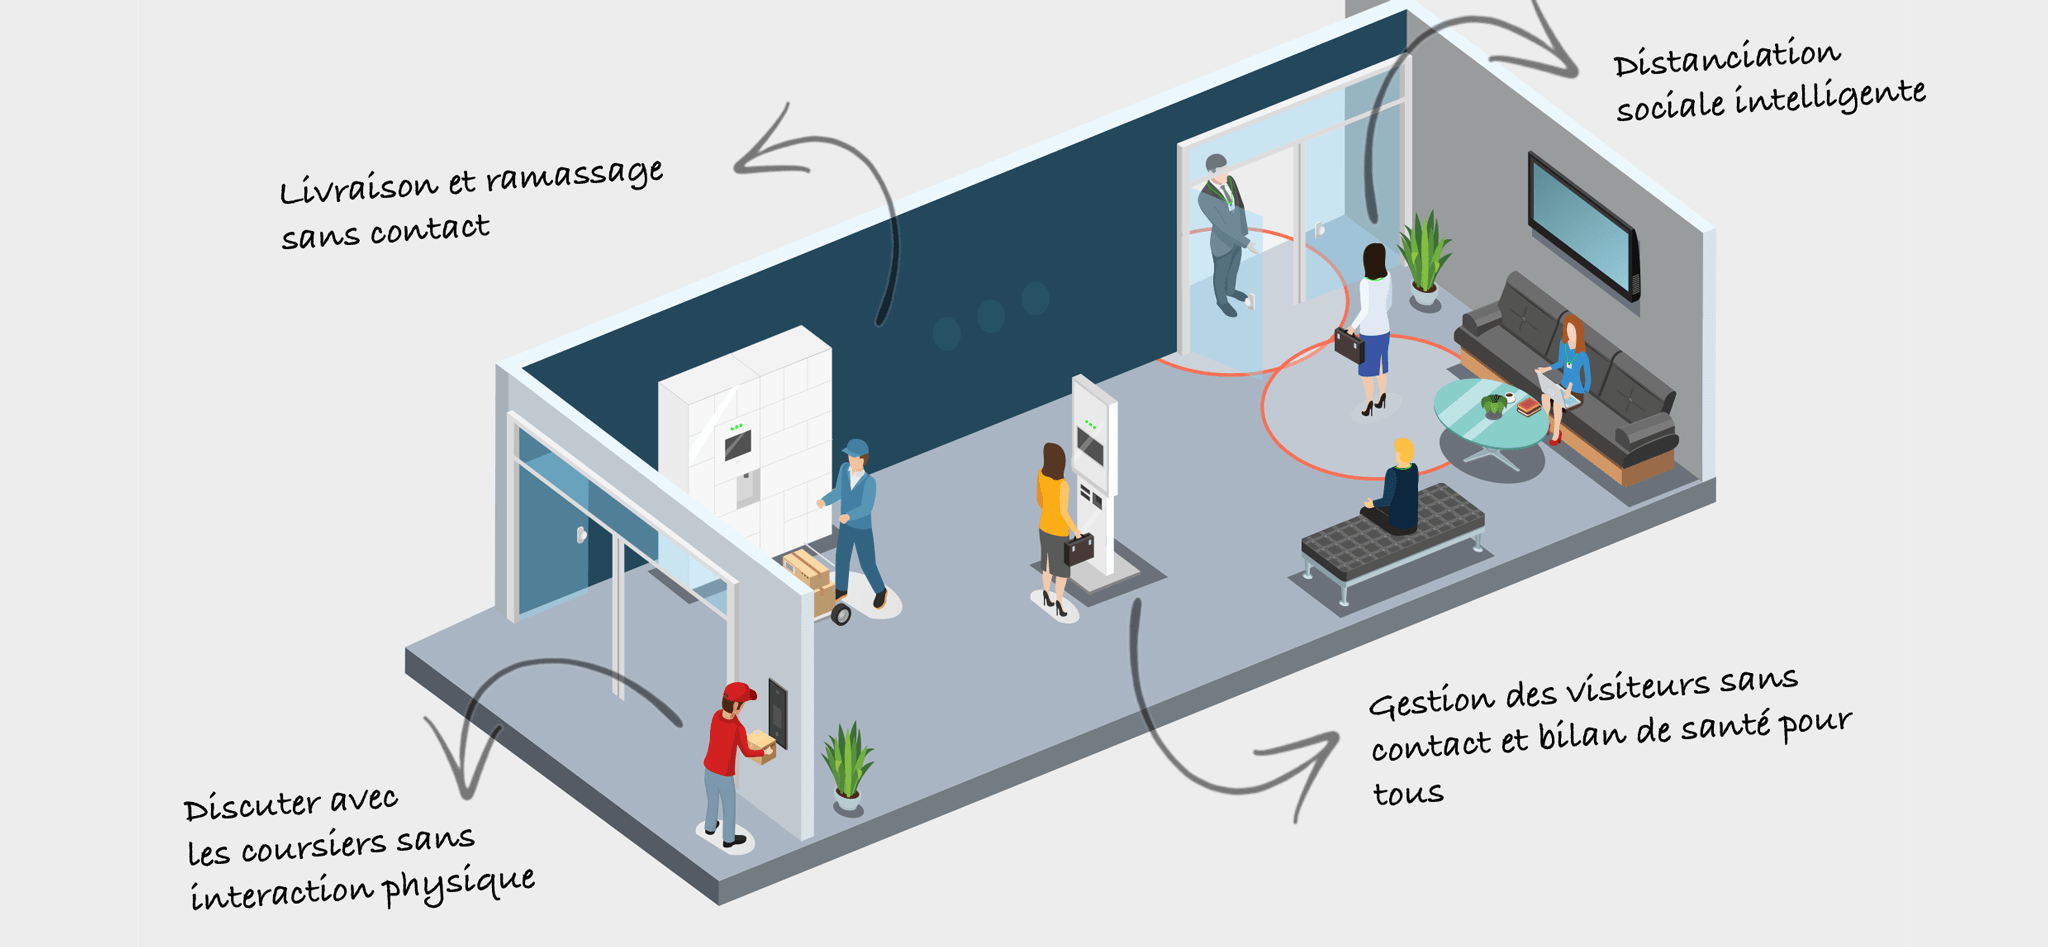 Office Solution sheet Reception Virtuelle 1